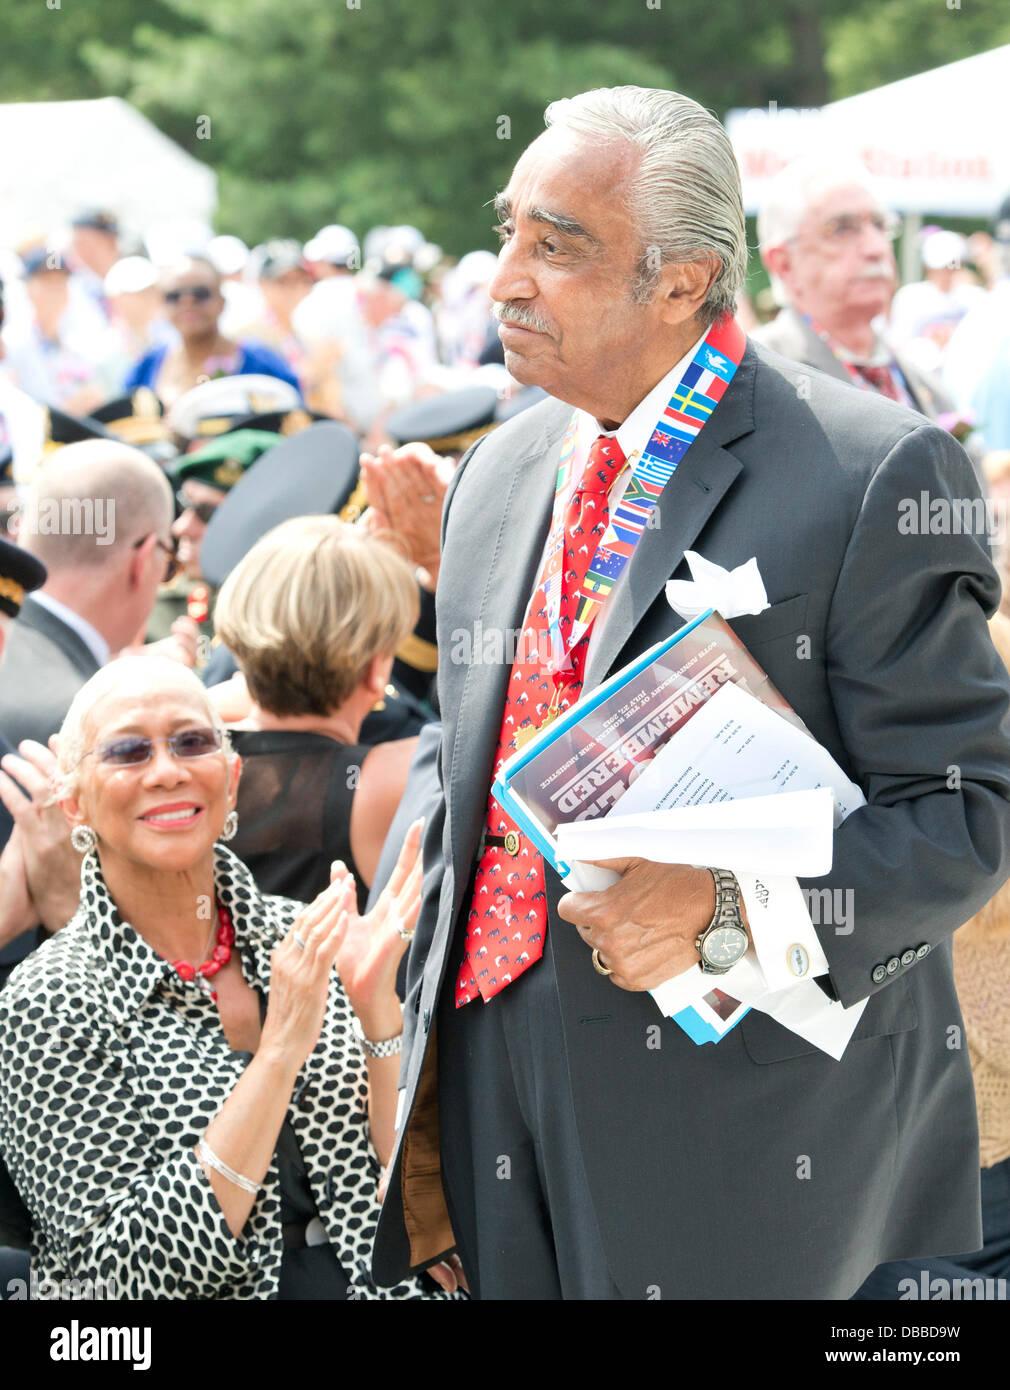 Washington DC, USA. 27th July 2013. United States Representative Charlie Rangel (Democrat of New York) stands when - Stock Image